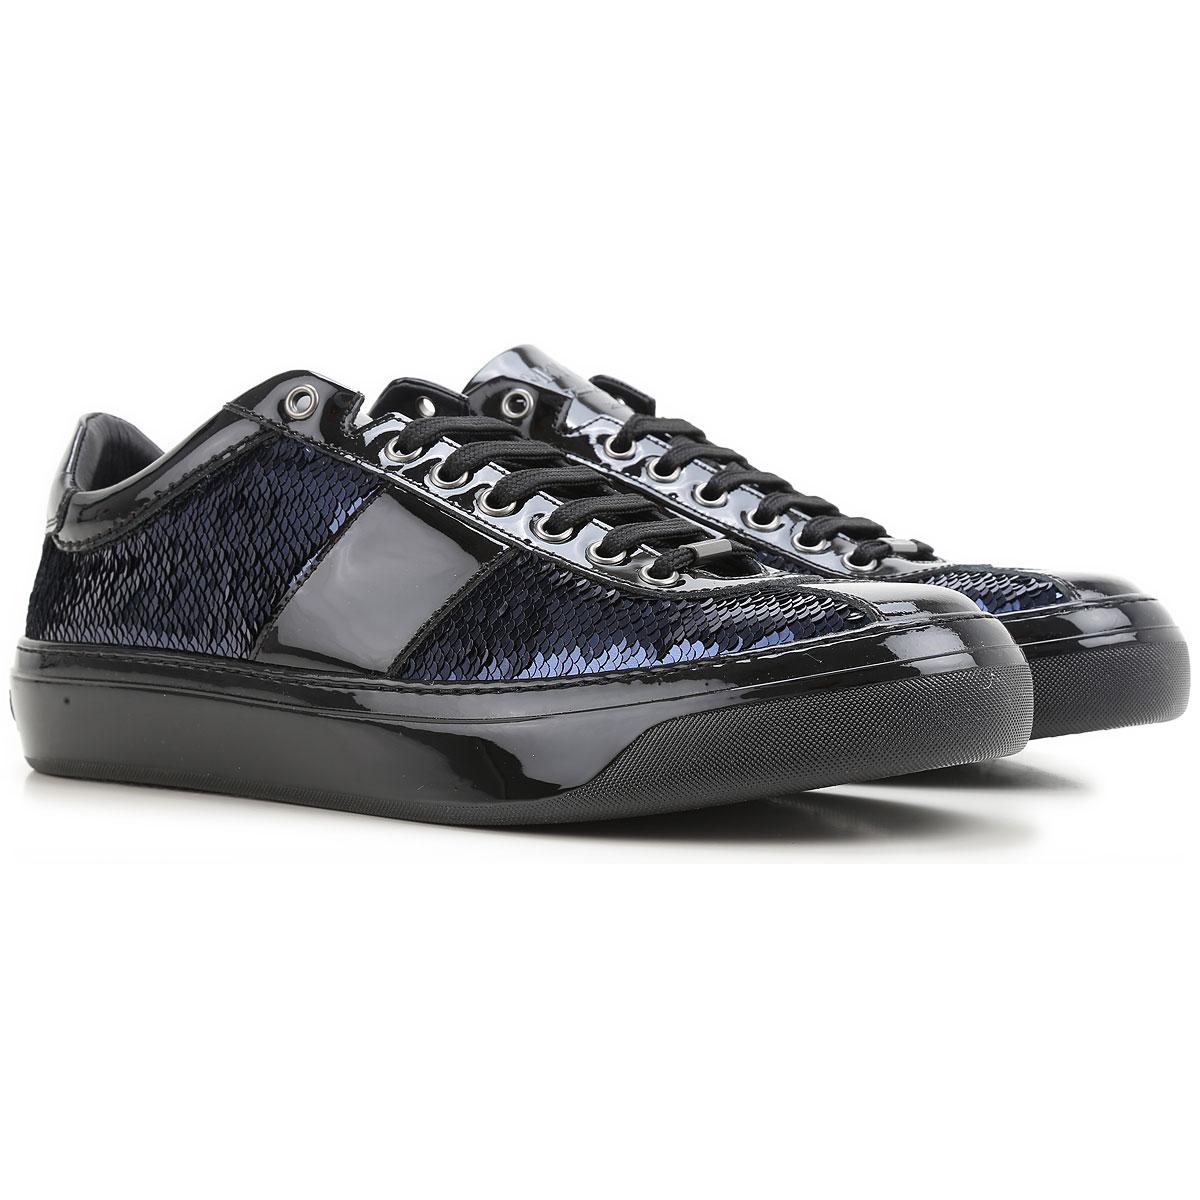 chaussures homme jimmy choo code produit portman aif blu. Black Bedroom Furniture Sets. Home Design Ideas